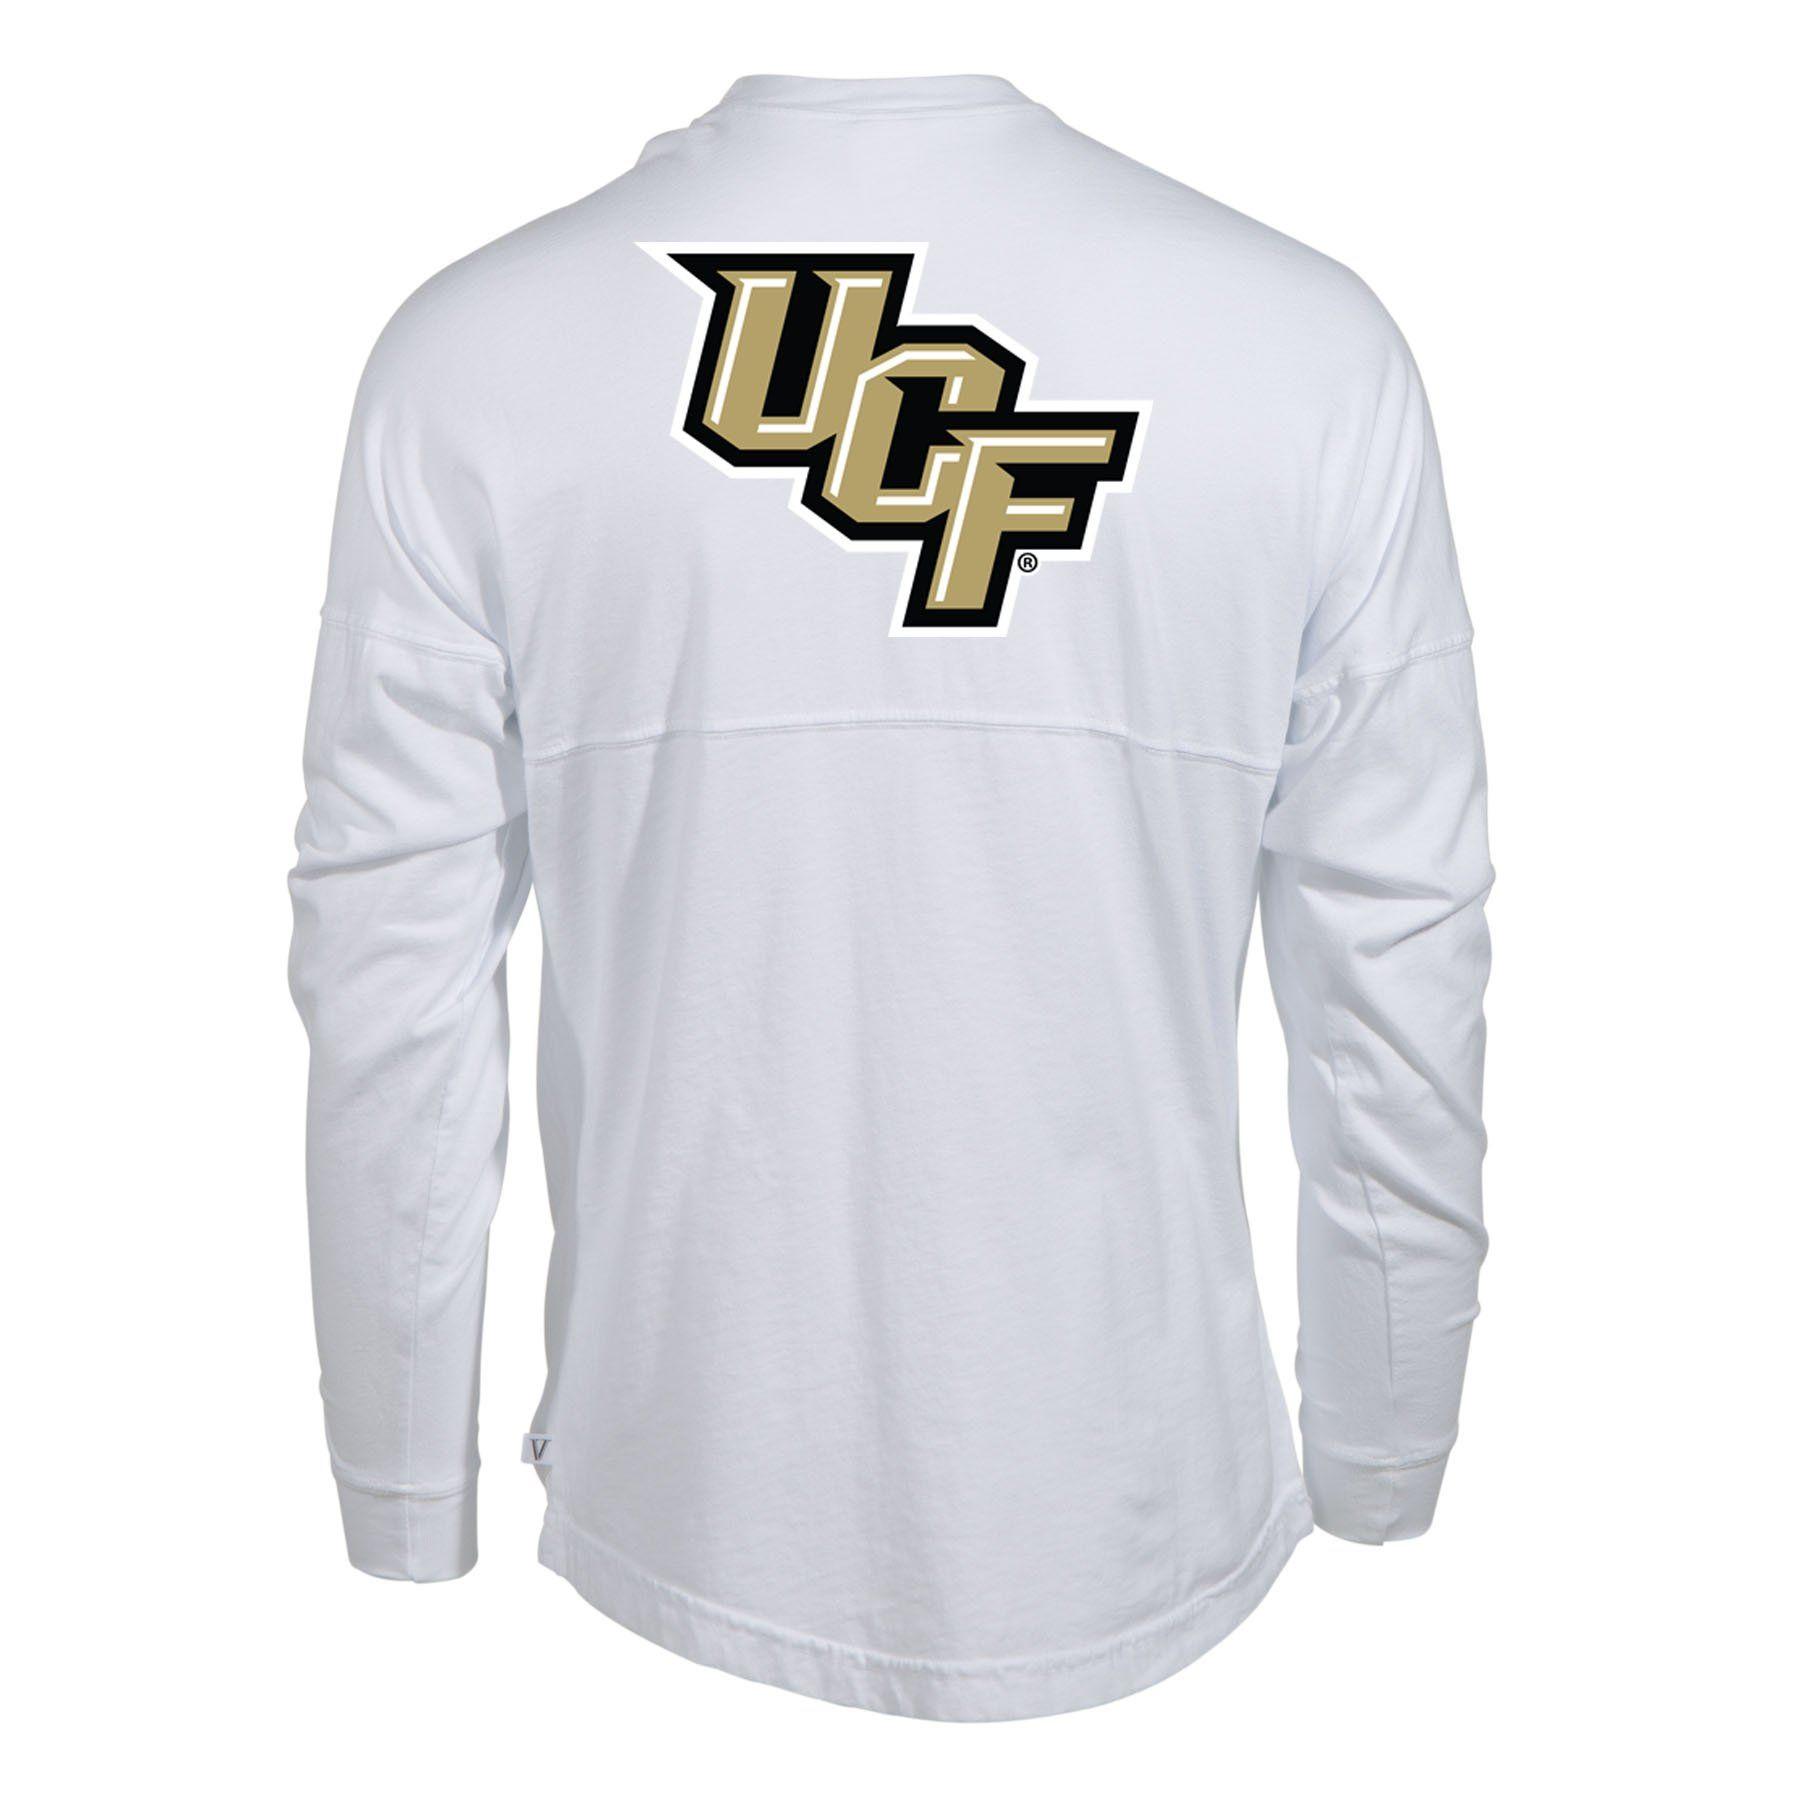 brand new 26f28 7bbd2 UCF Knights Women's College NCAA T-Shirt Women's Long Sleeve ...